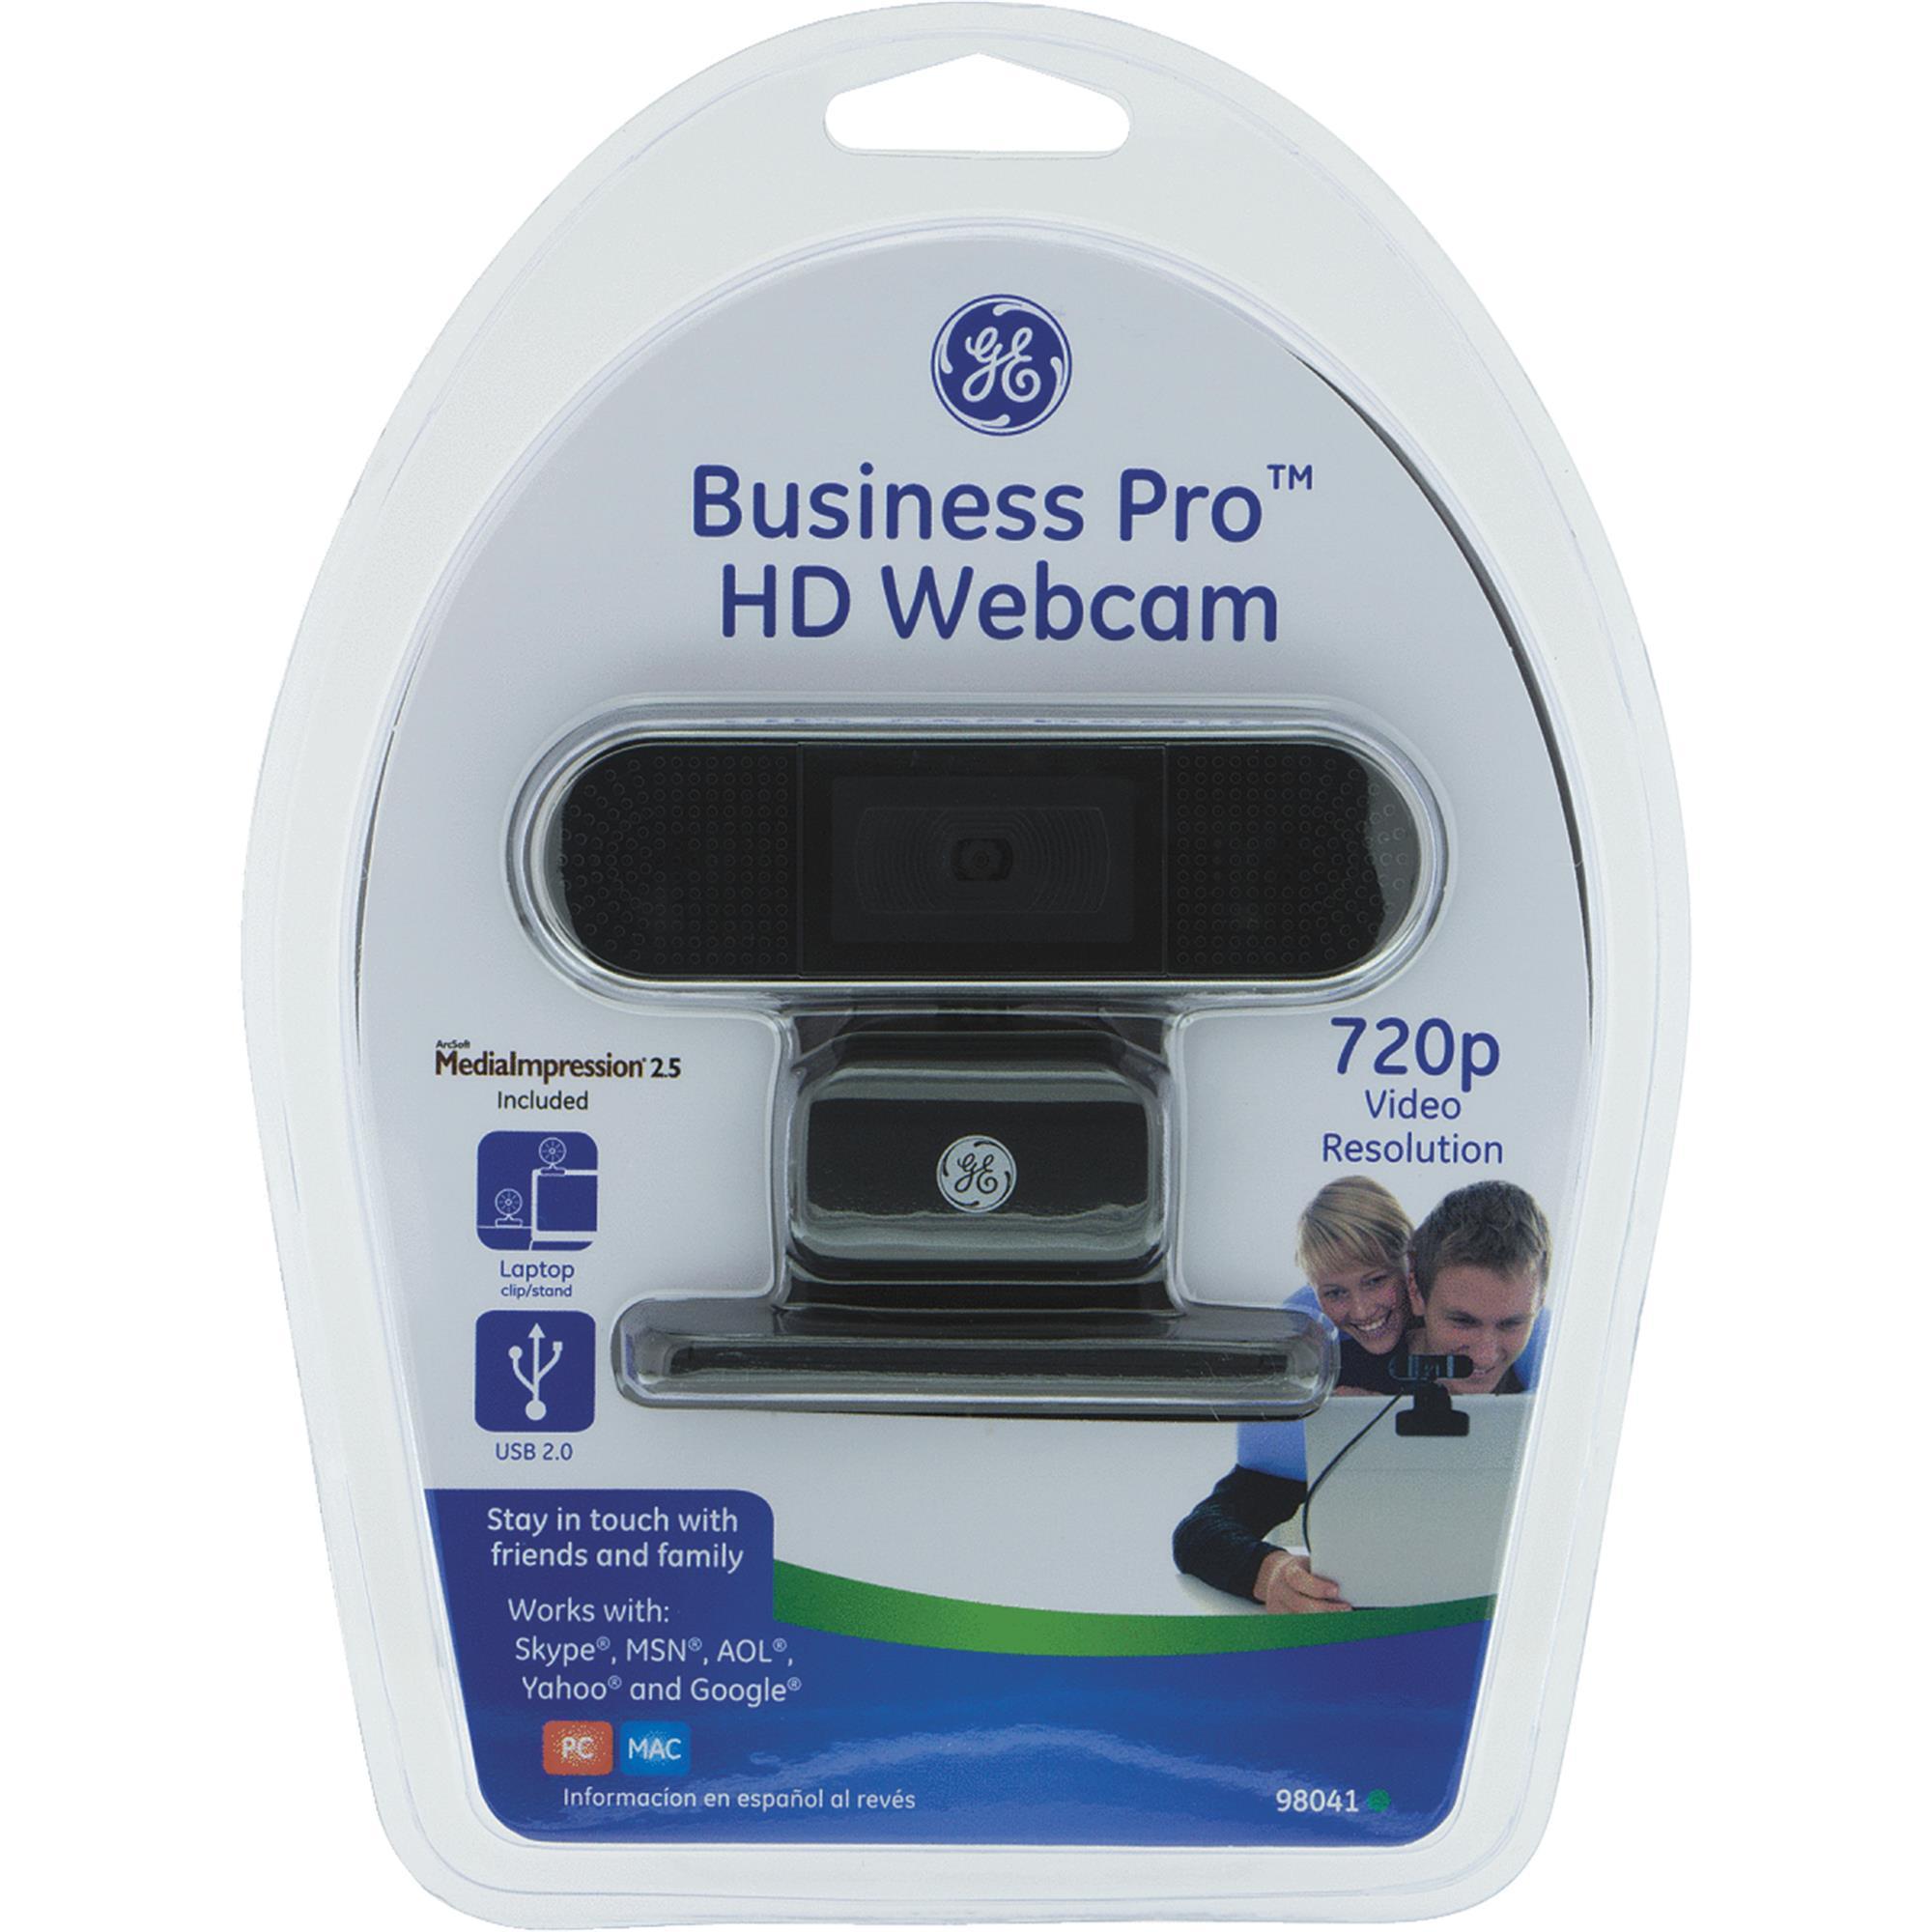 Business Pro HD Webcam (4 Mega Pixels)